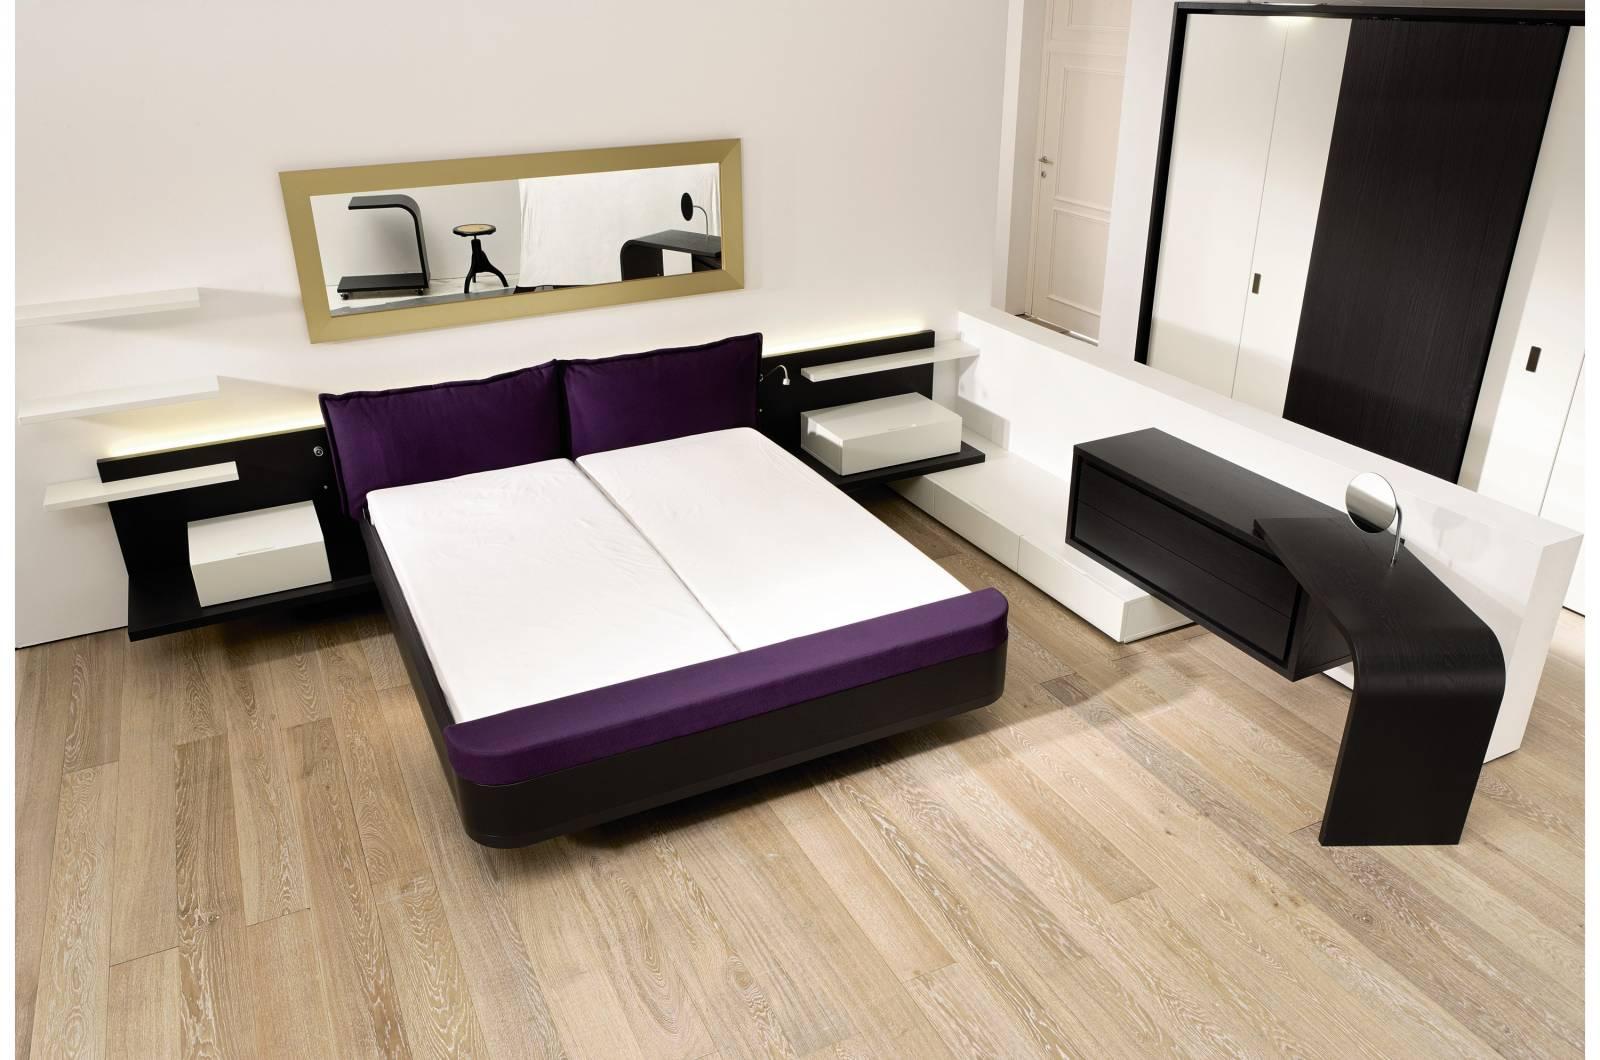 Черно-белый декор спальни в стиле модерн